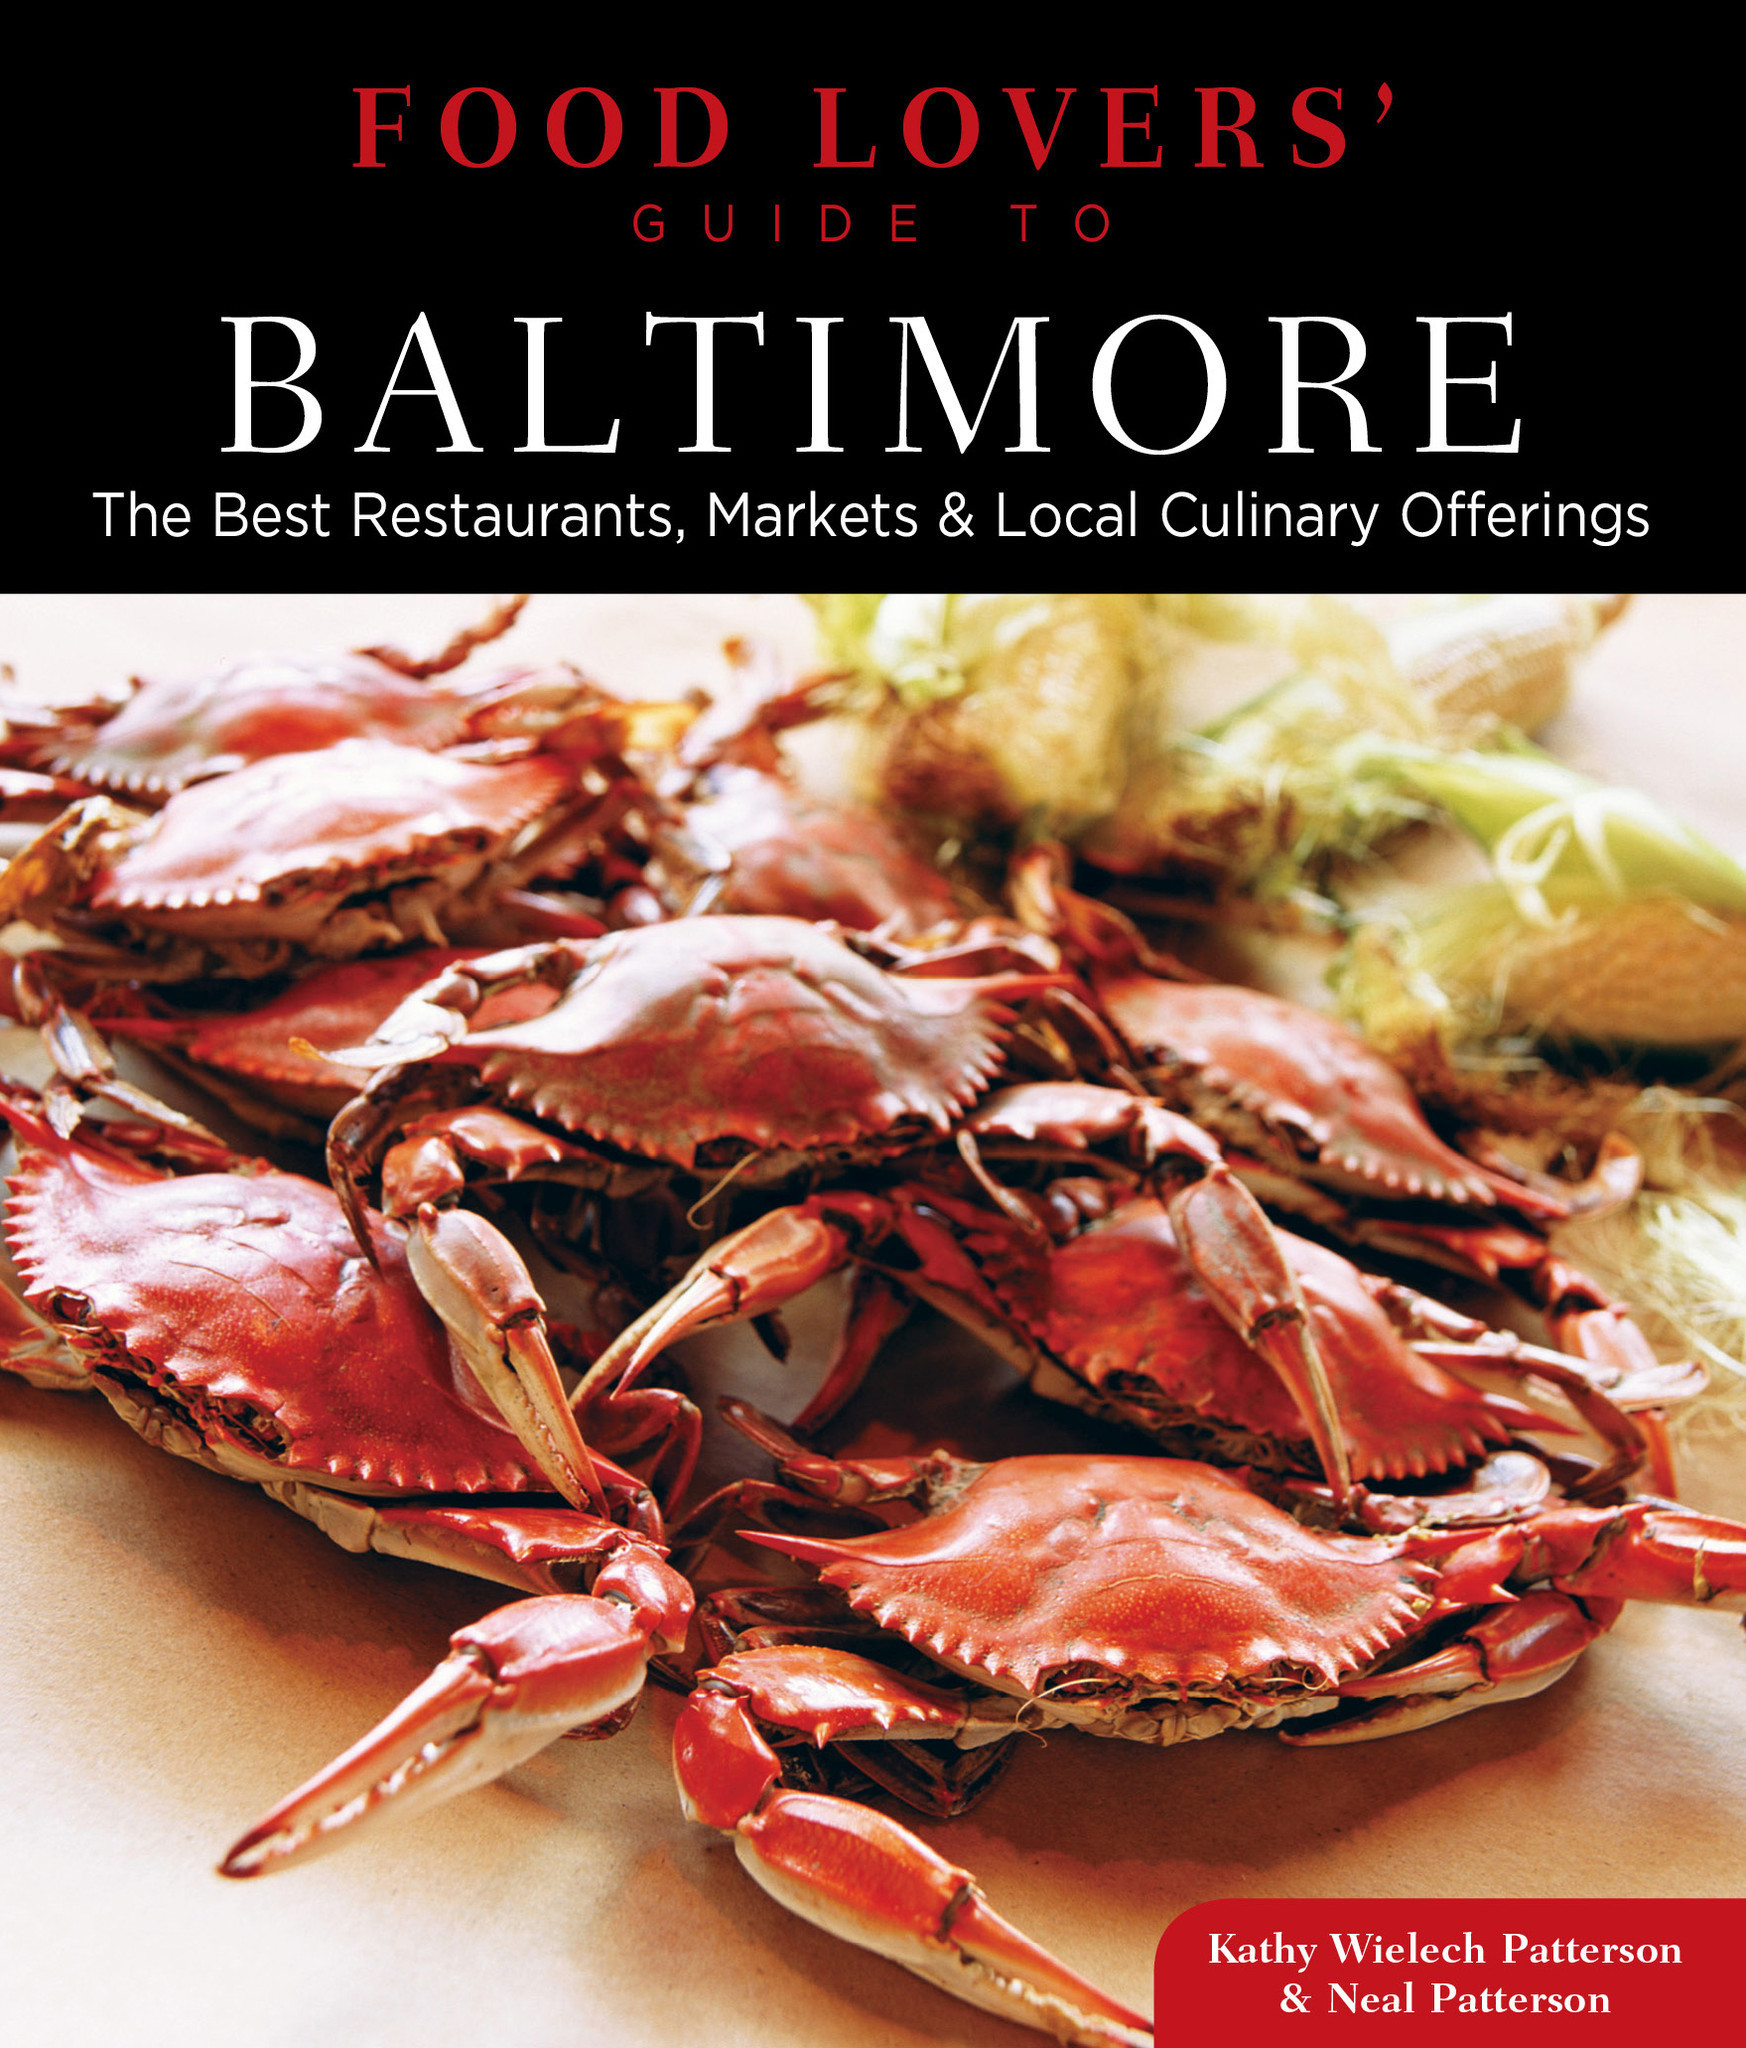 Minxeats recipes, recaps, and restaurant reviews: food lovers.